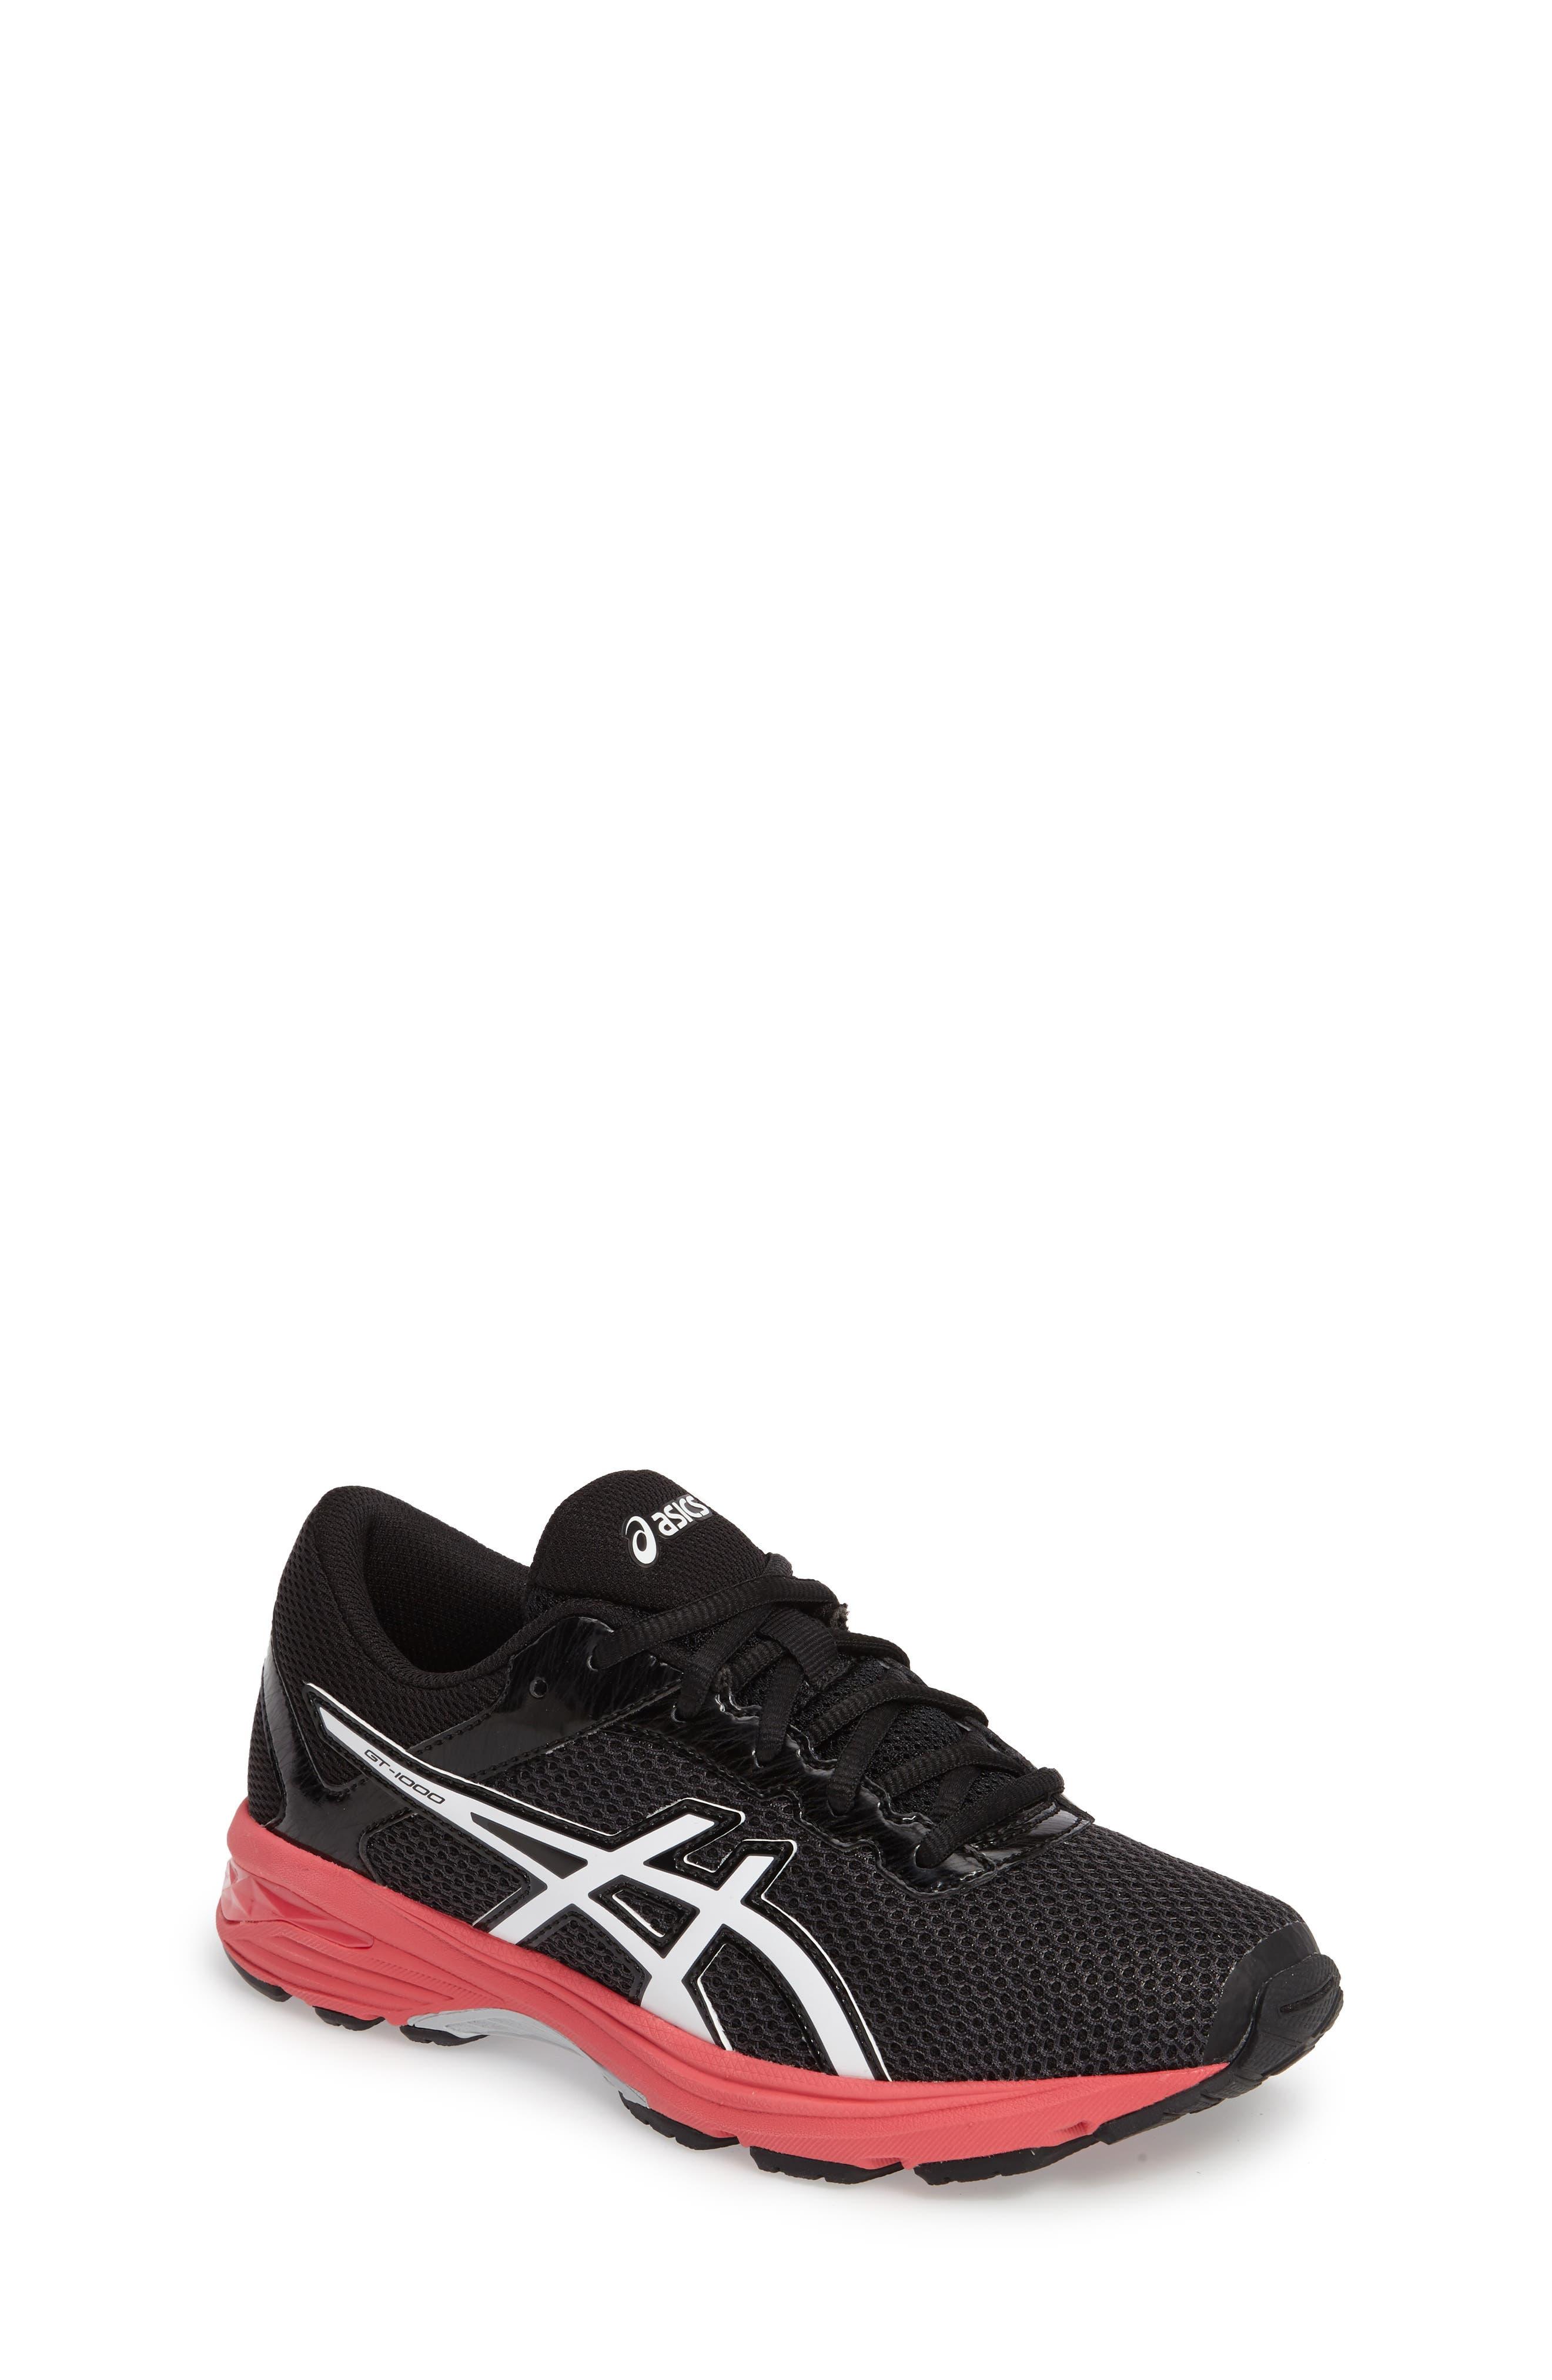 Asics GT-1000<sup>™</sup> 6 GS Sneaker,                             Main thumbnail 4, color,